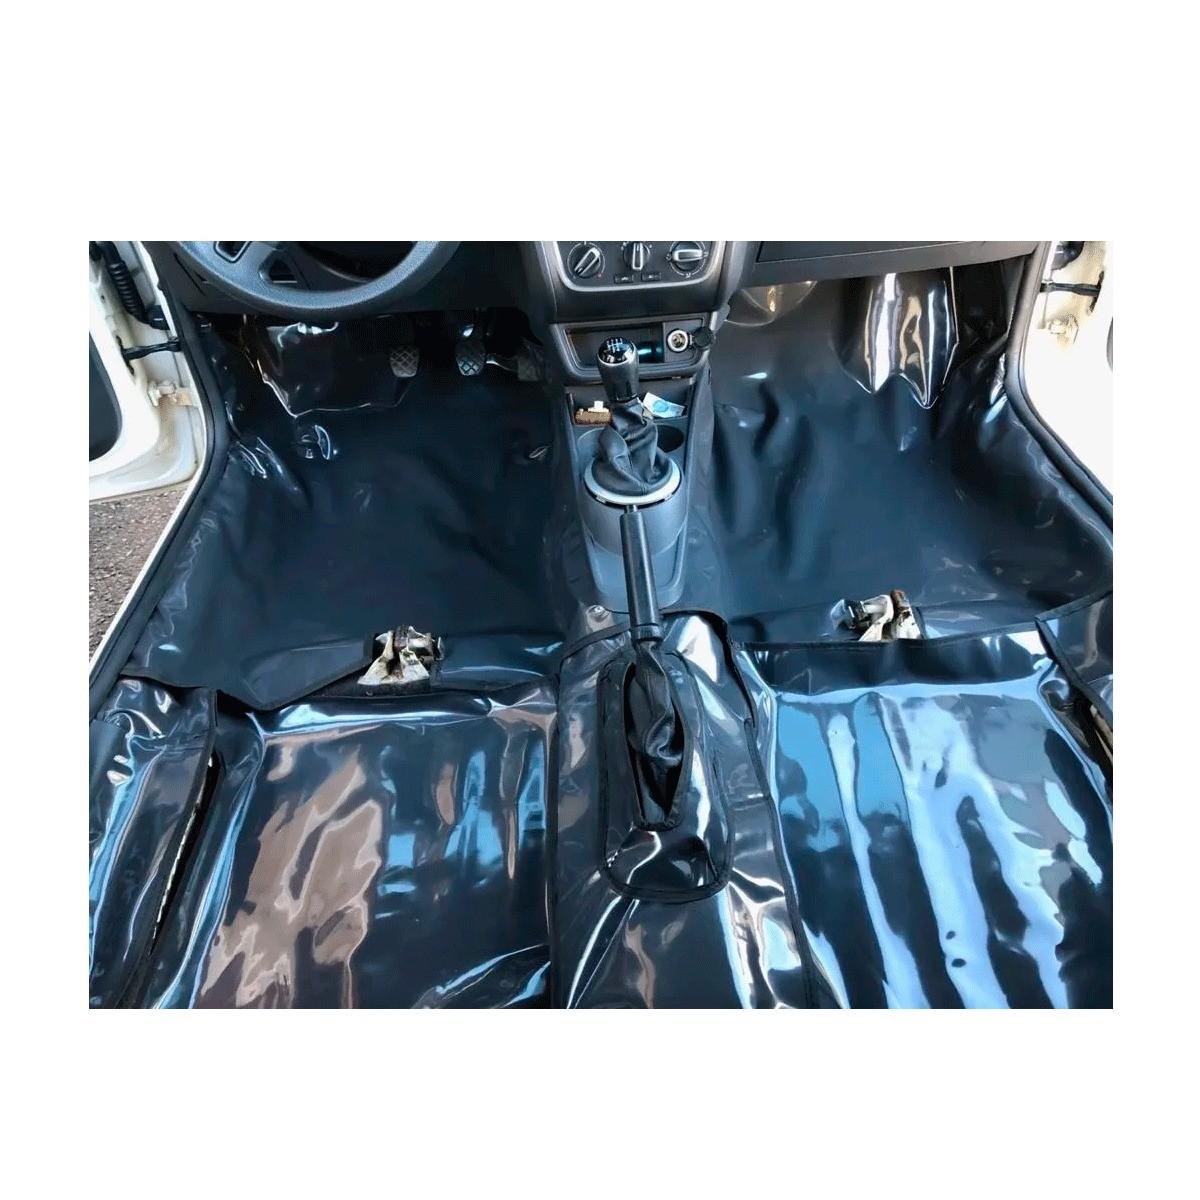 Tapete Proteção Assoalho da Ford Ká até 2000 em Vinil Verniz Impermeável